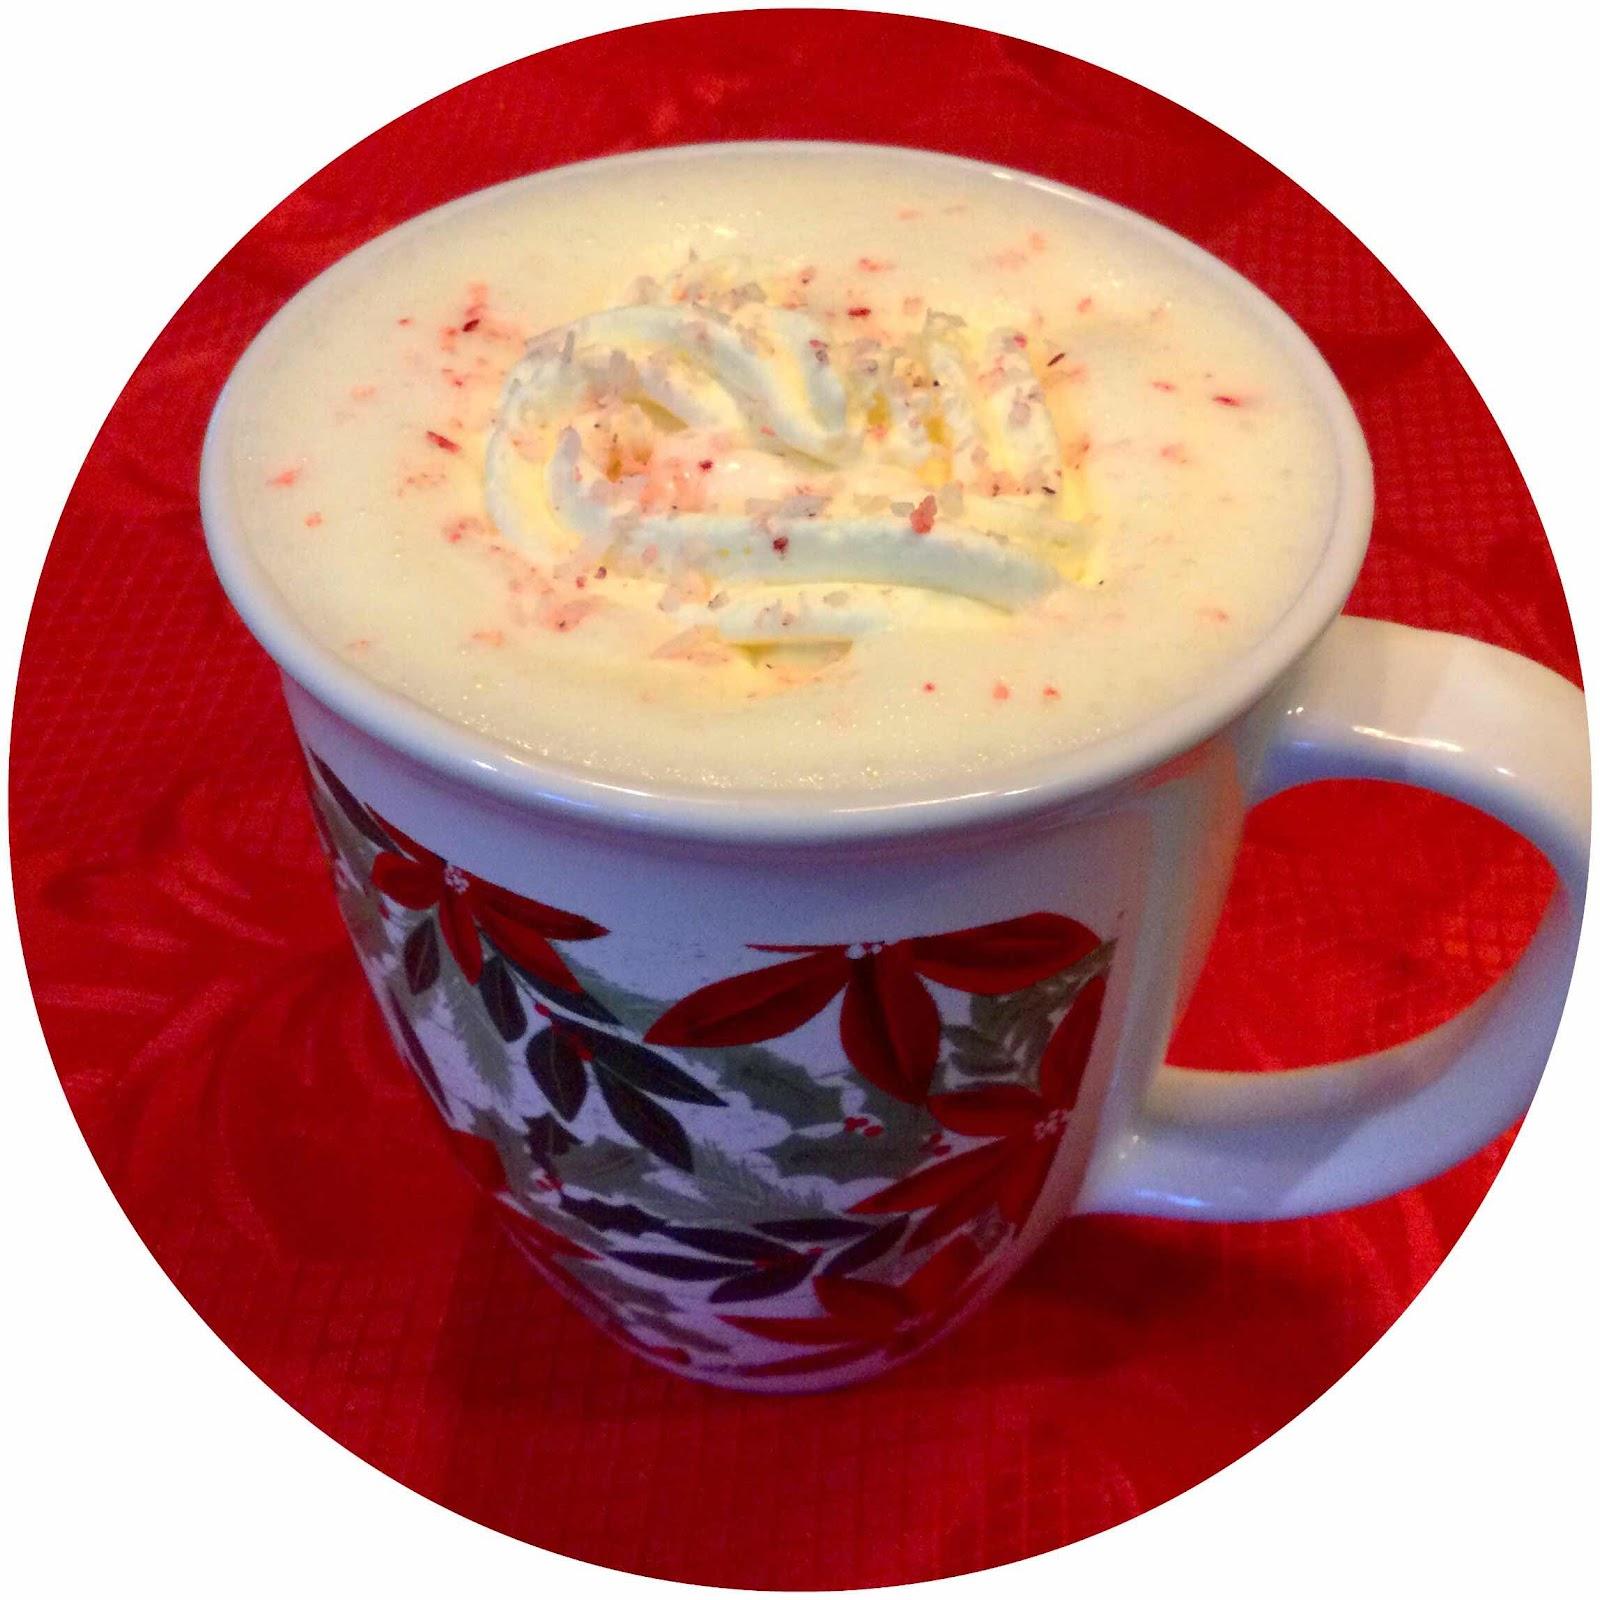 Keto White Chocolate Peppermint Cocoa